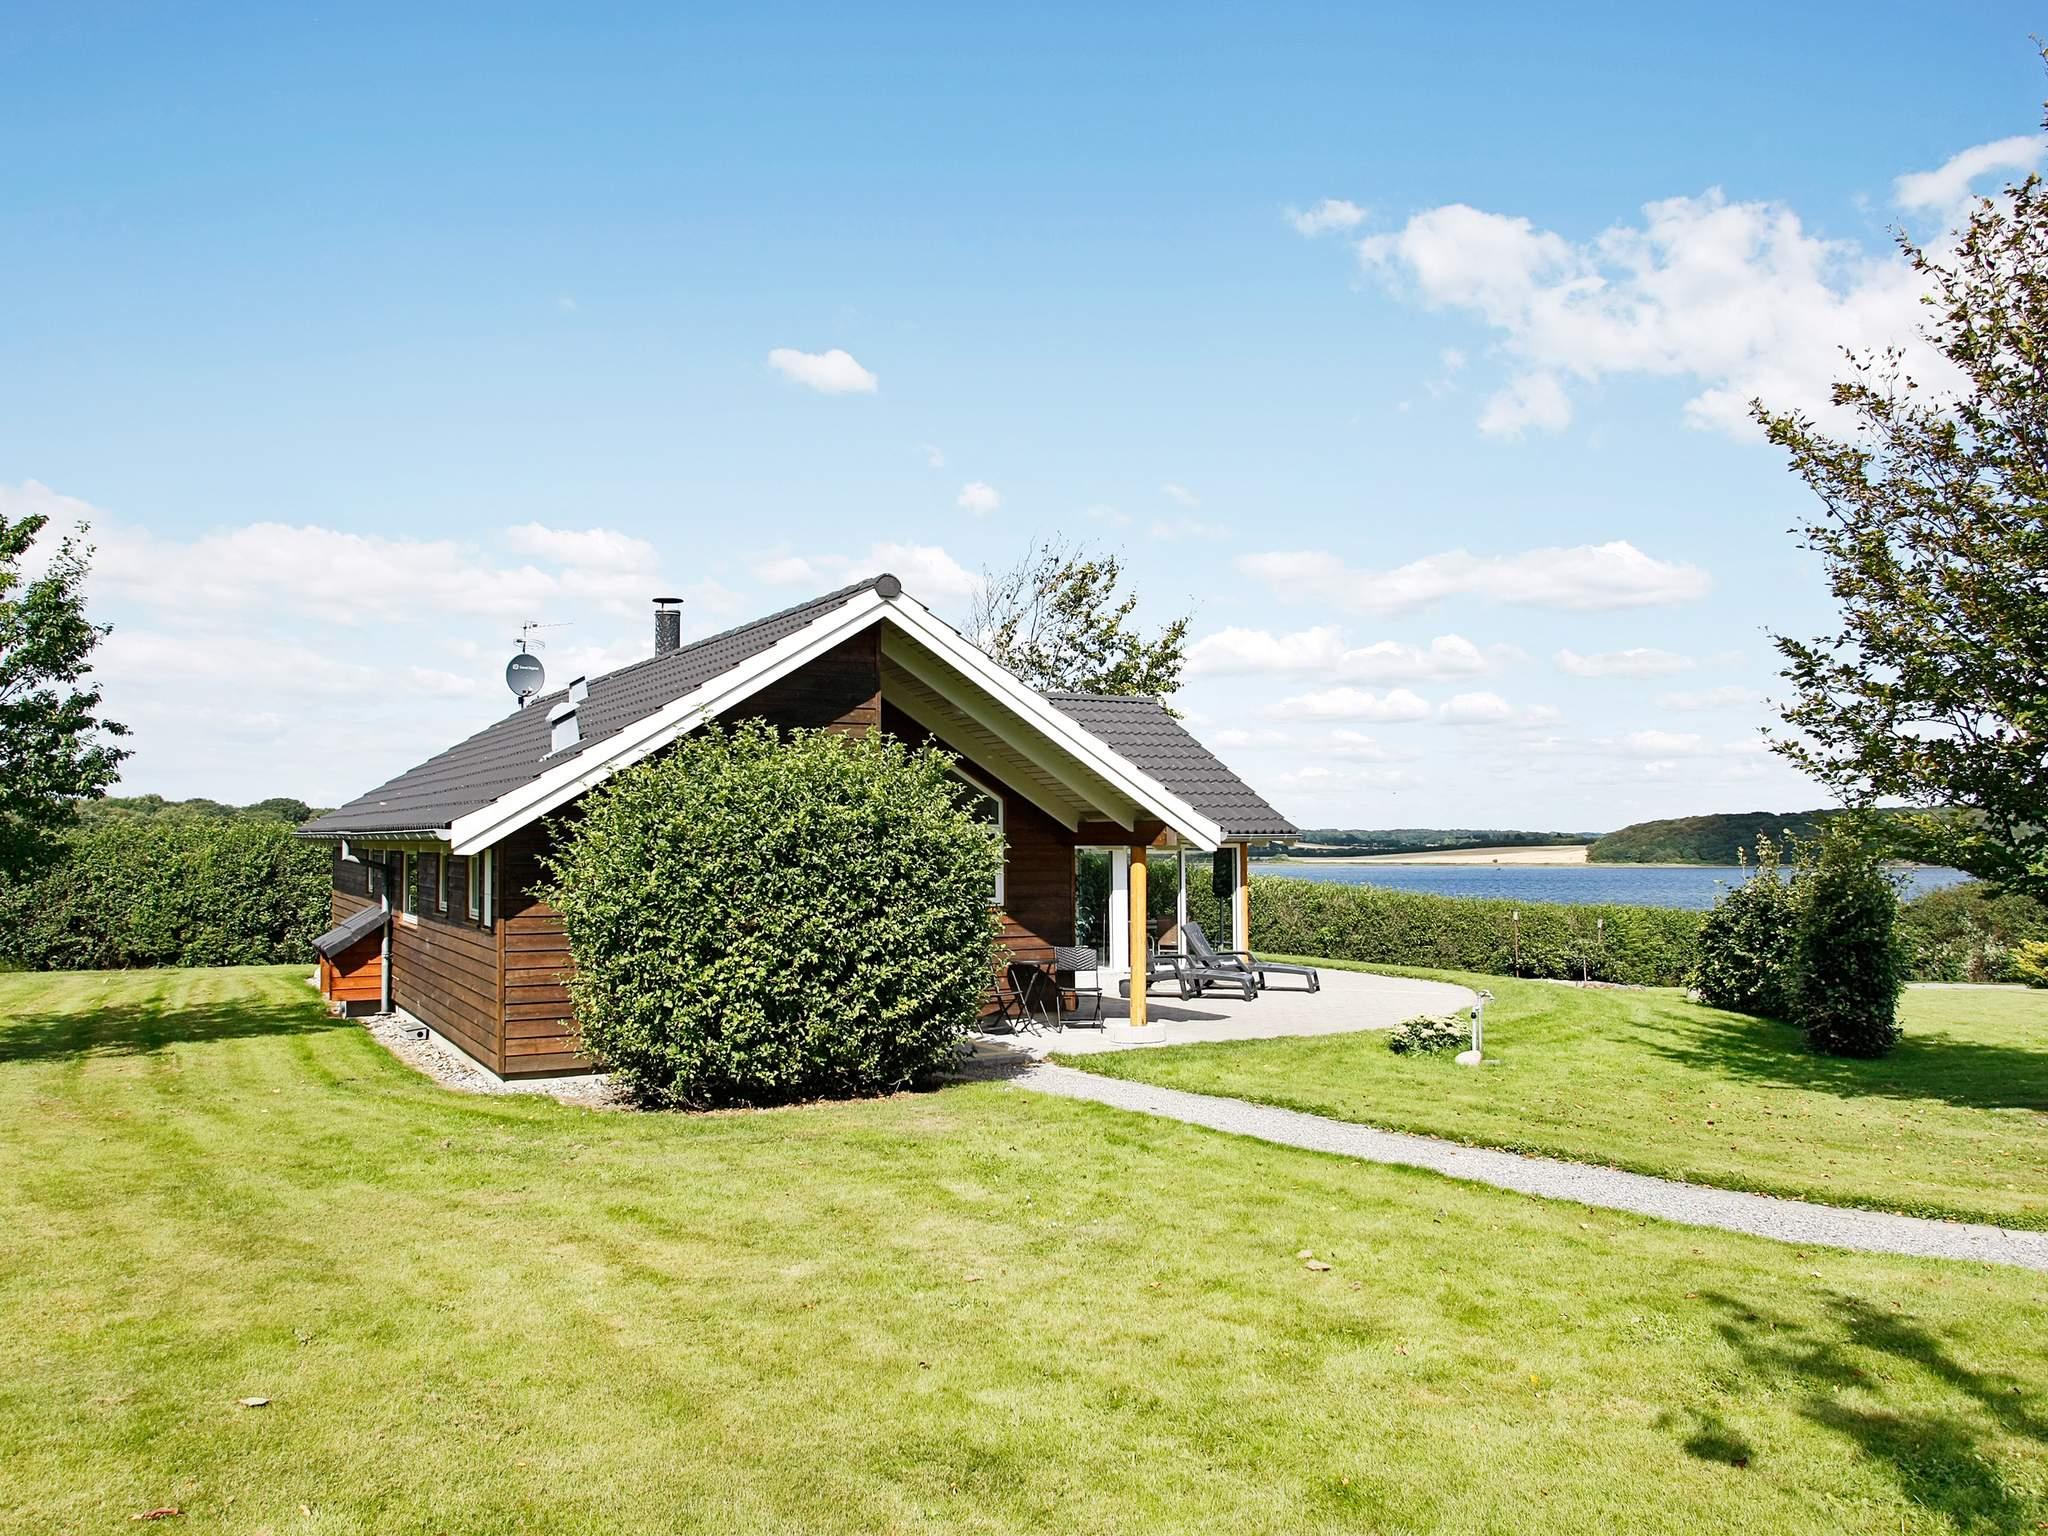 Maison de vacances Astrup Vig (407189), Roslev, , Limfjord, Danemark, image 16